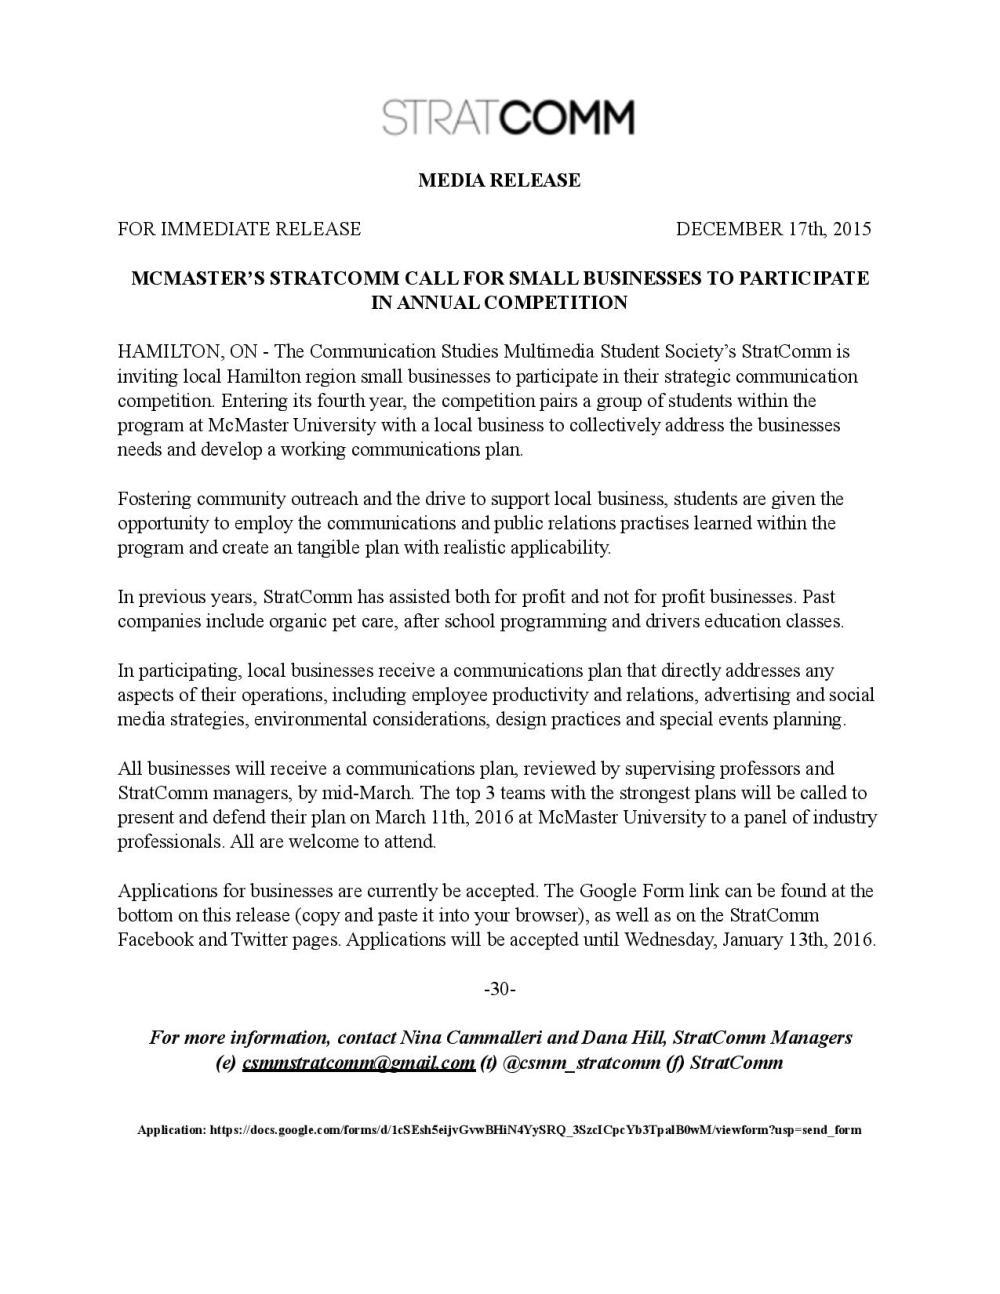 StratComm Press Release